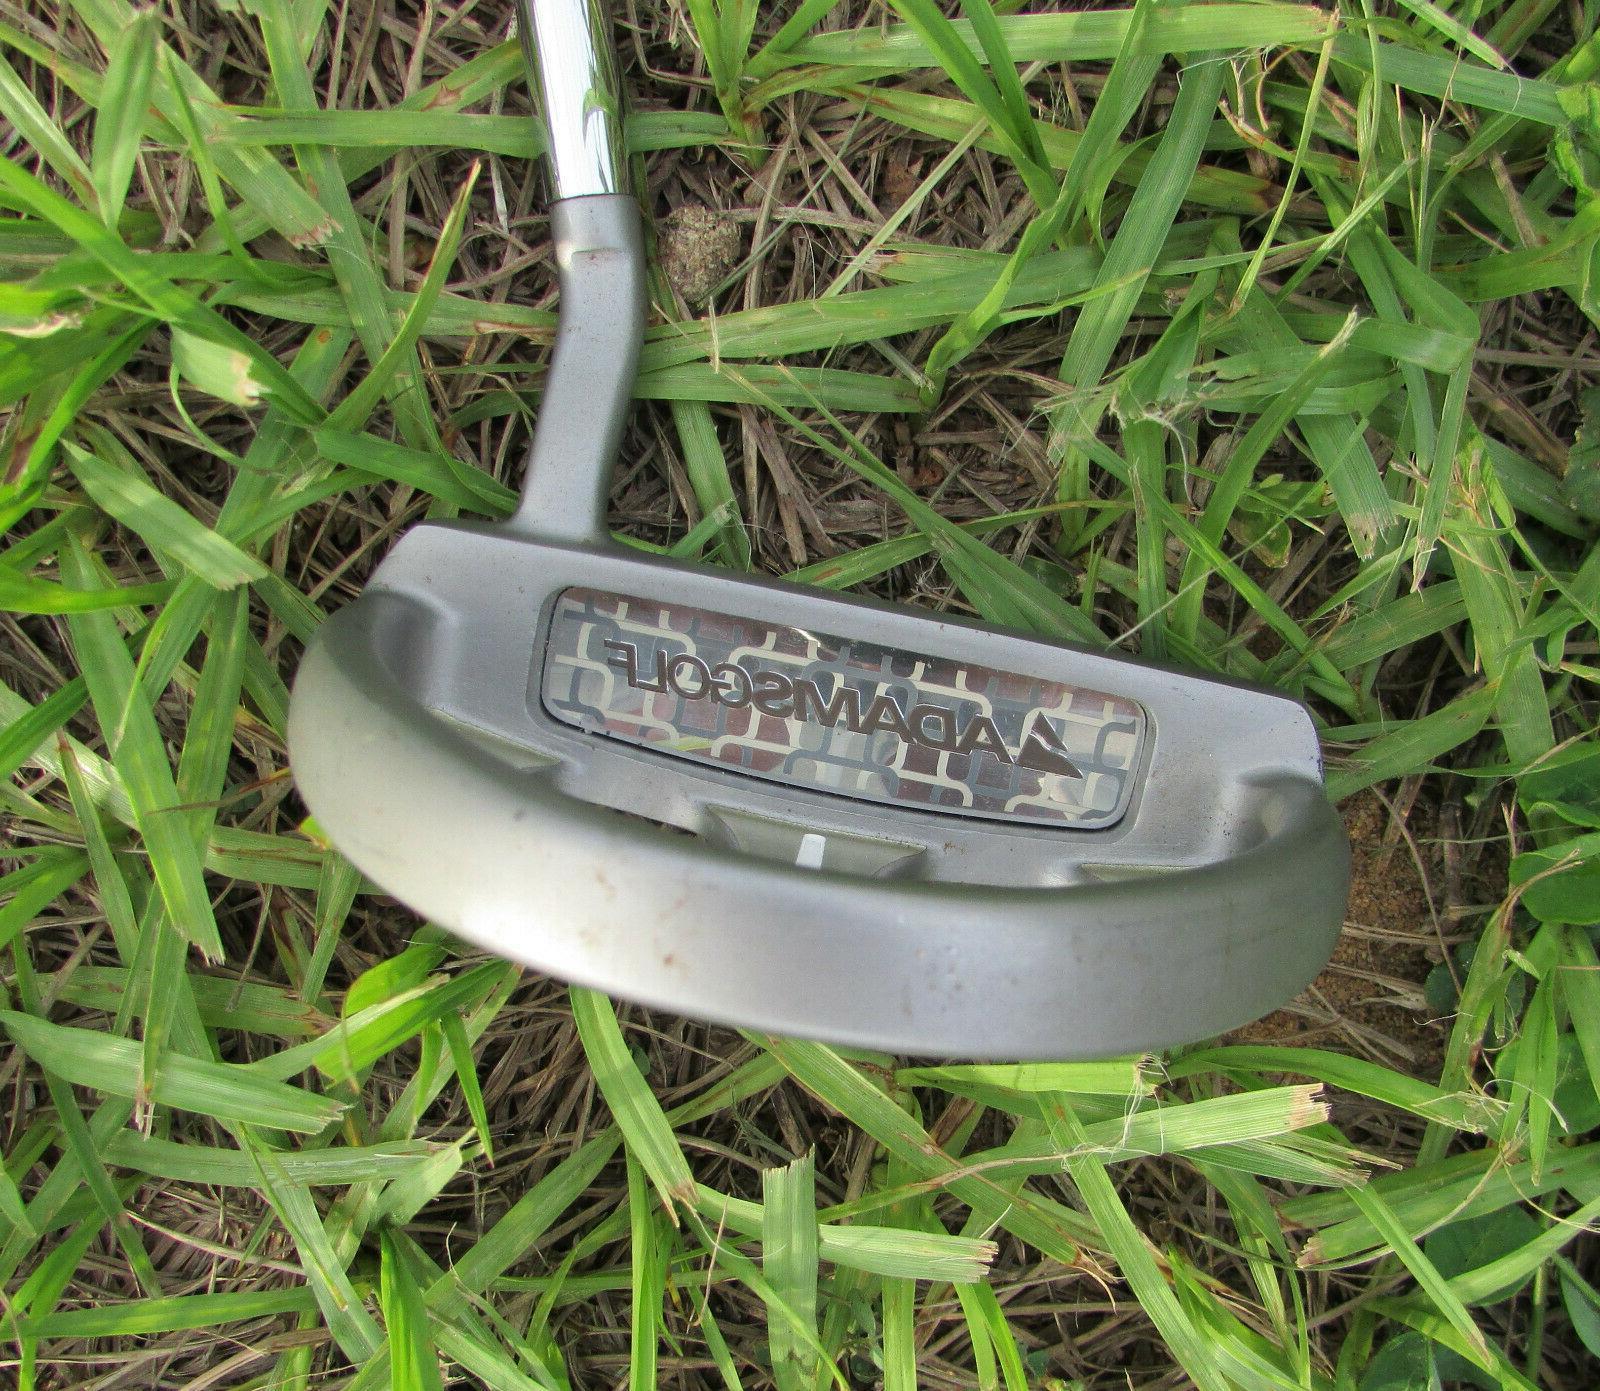 "Adams Idea 33"" Golf Club Never Used Left"